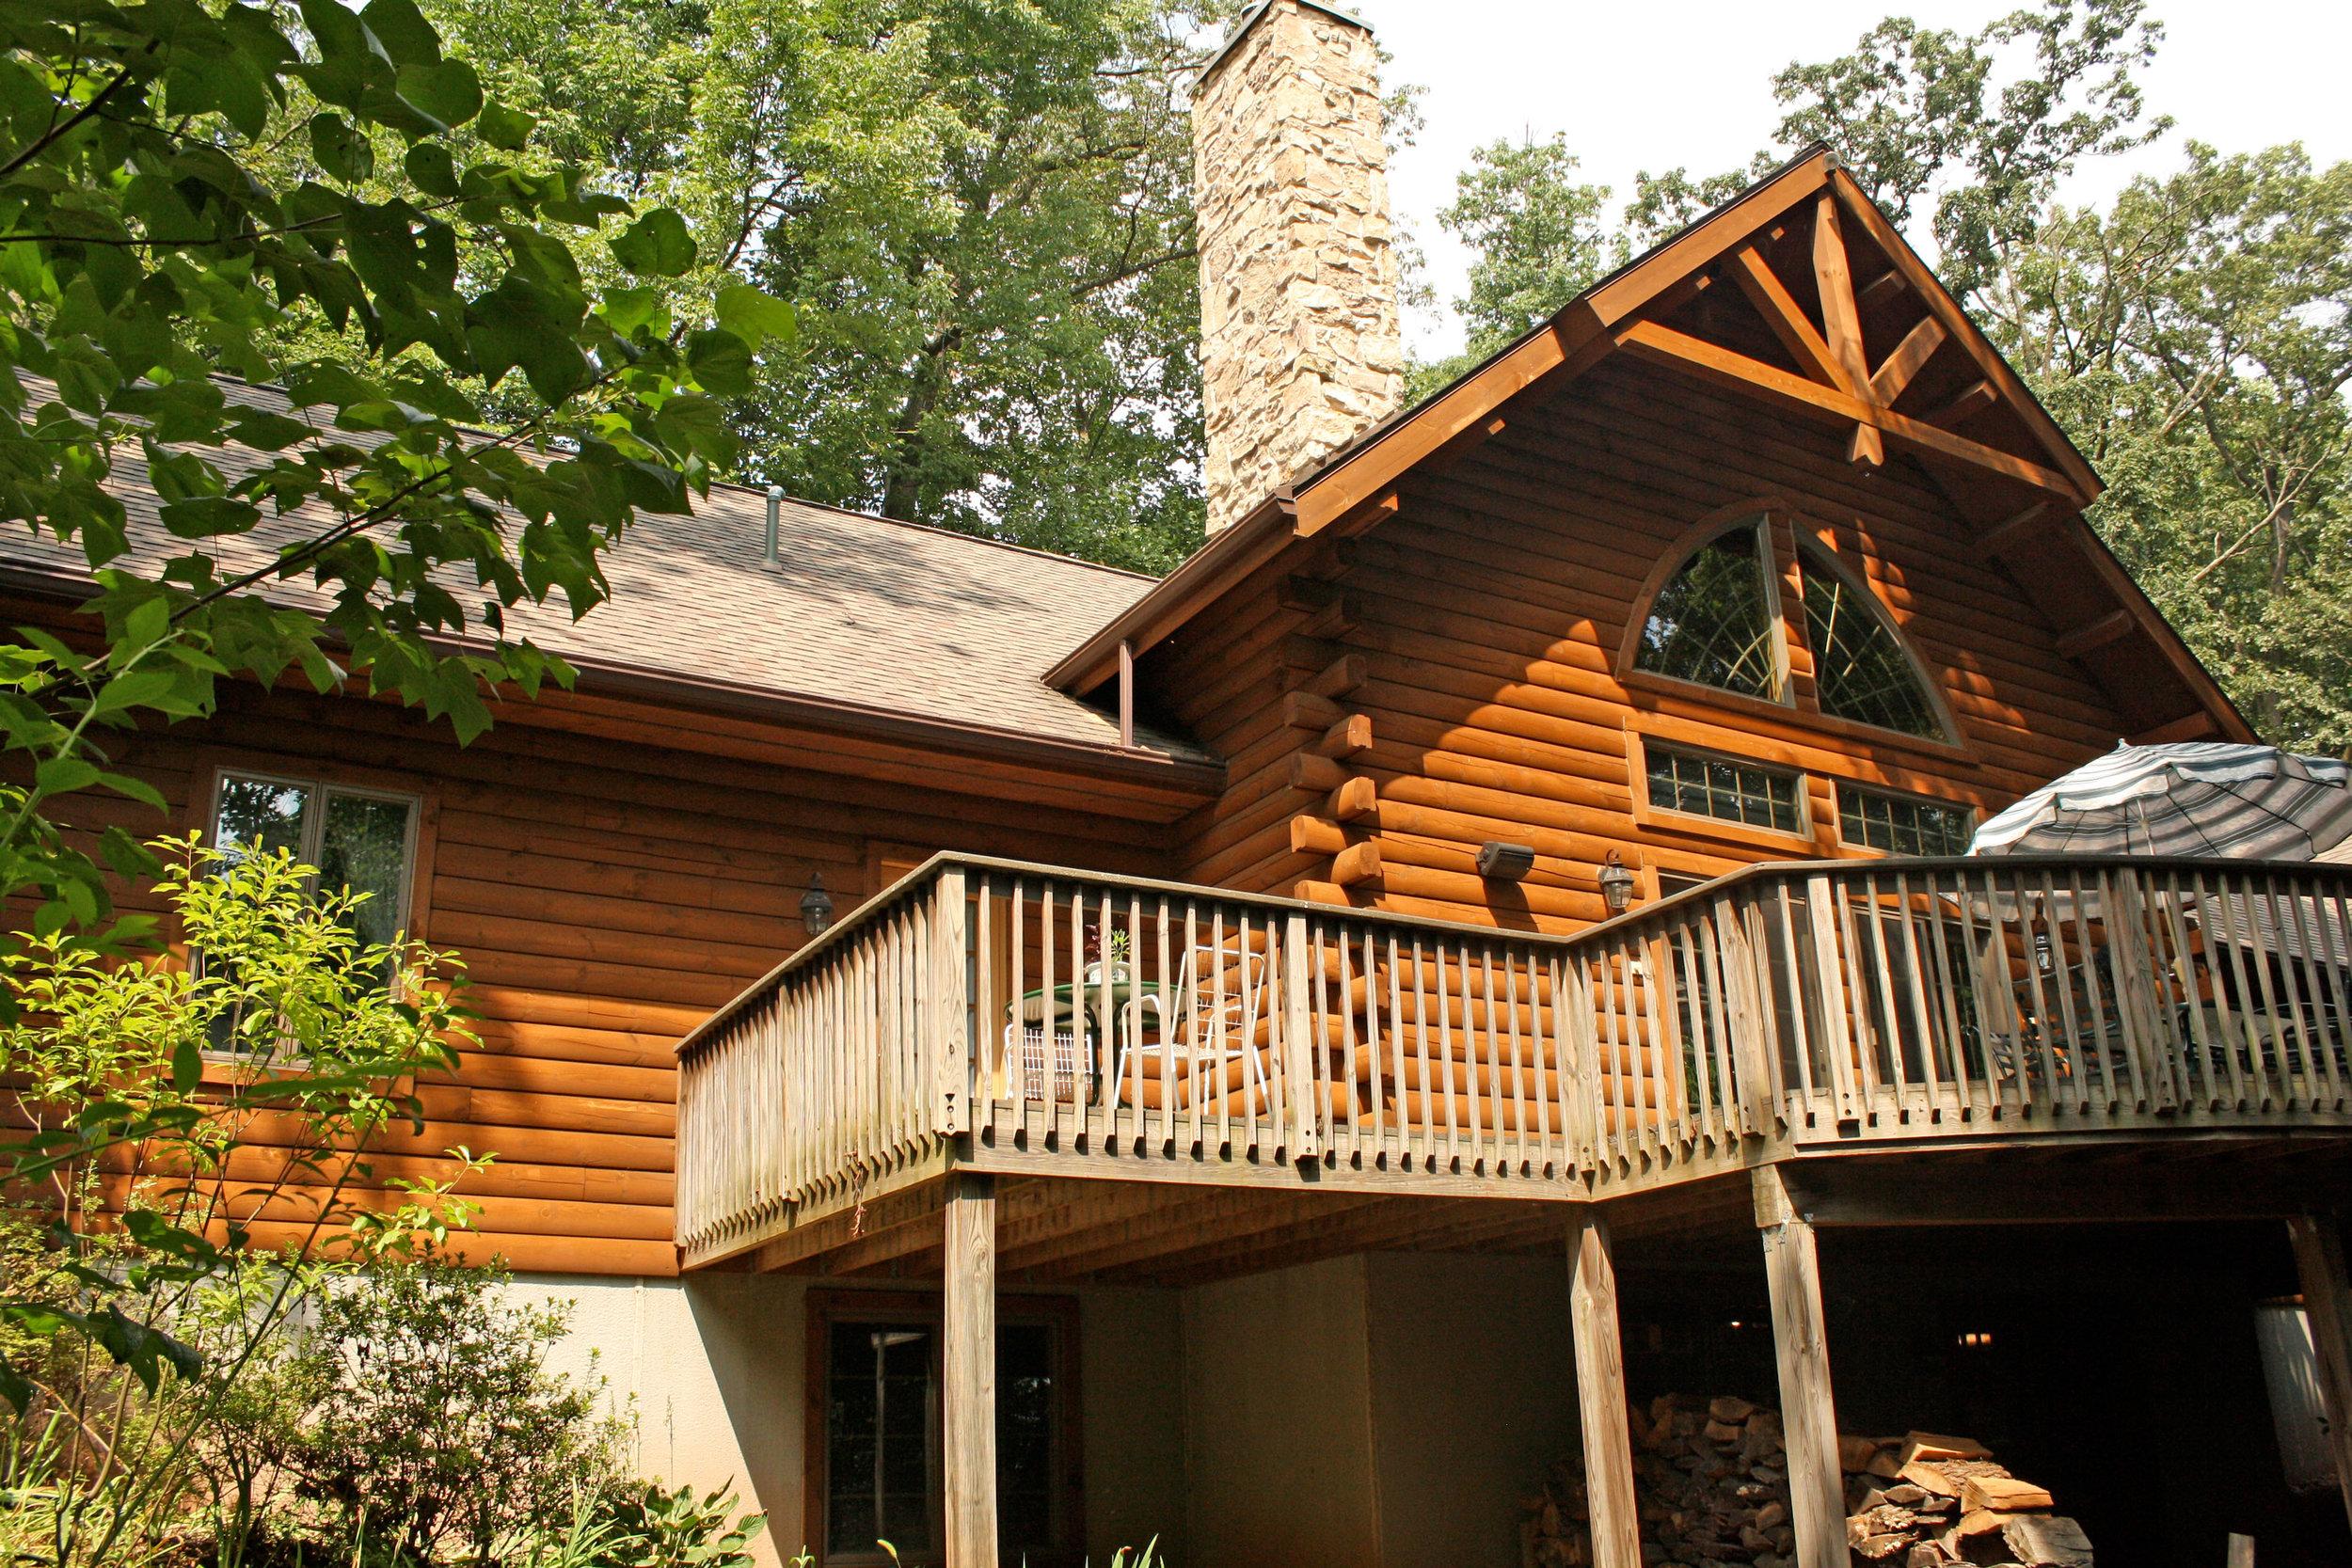 log-cabin-exterior-below-deck.jpg